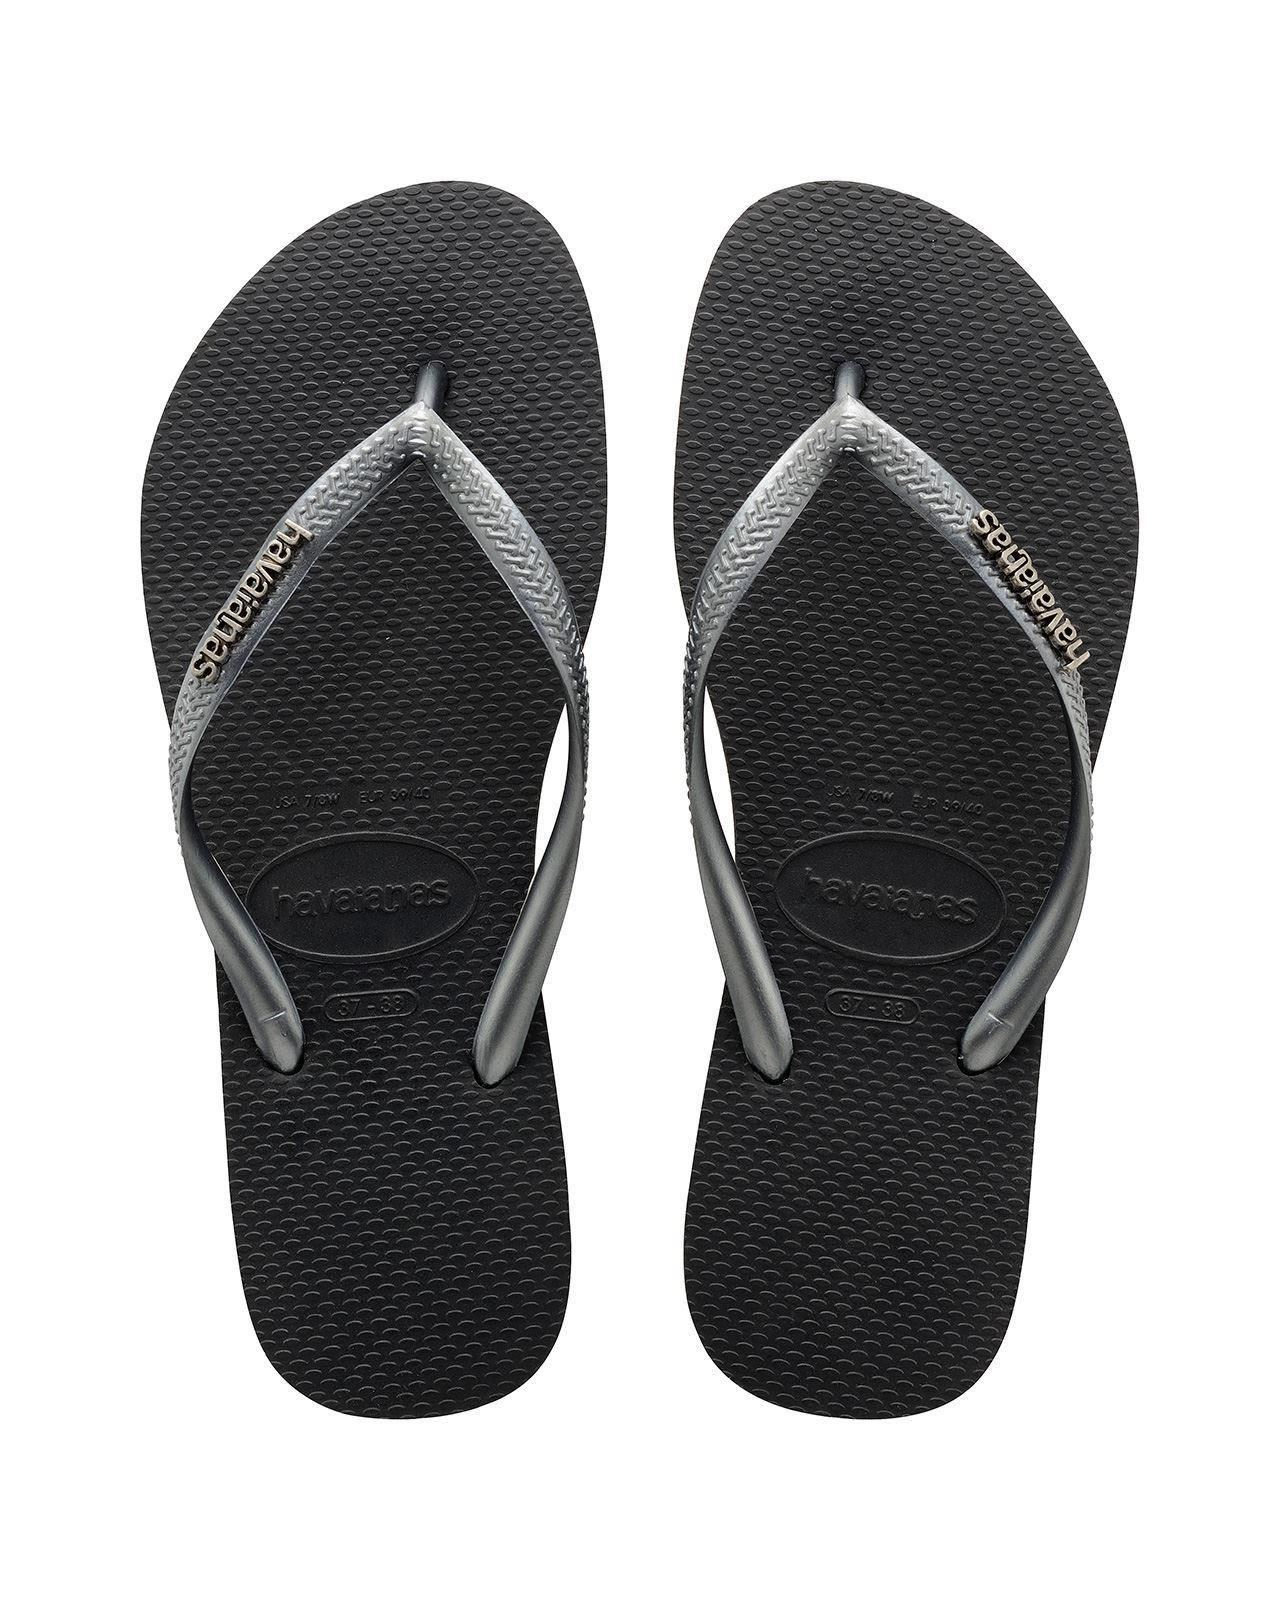 Havaianas-Slim-Logo-Top-Women-Flip-Flops-Sandals-Vary-Colors-All-Size